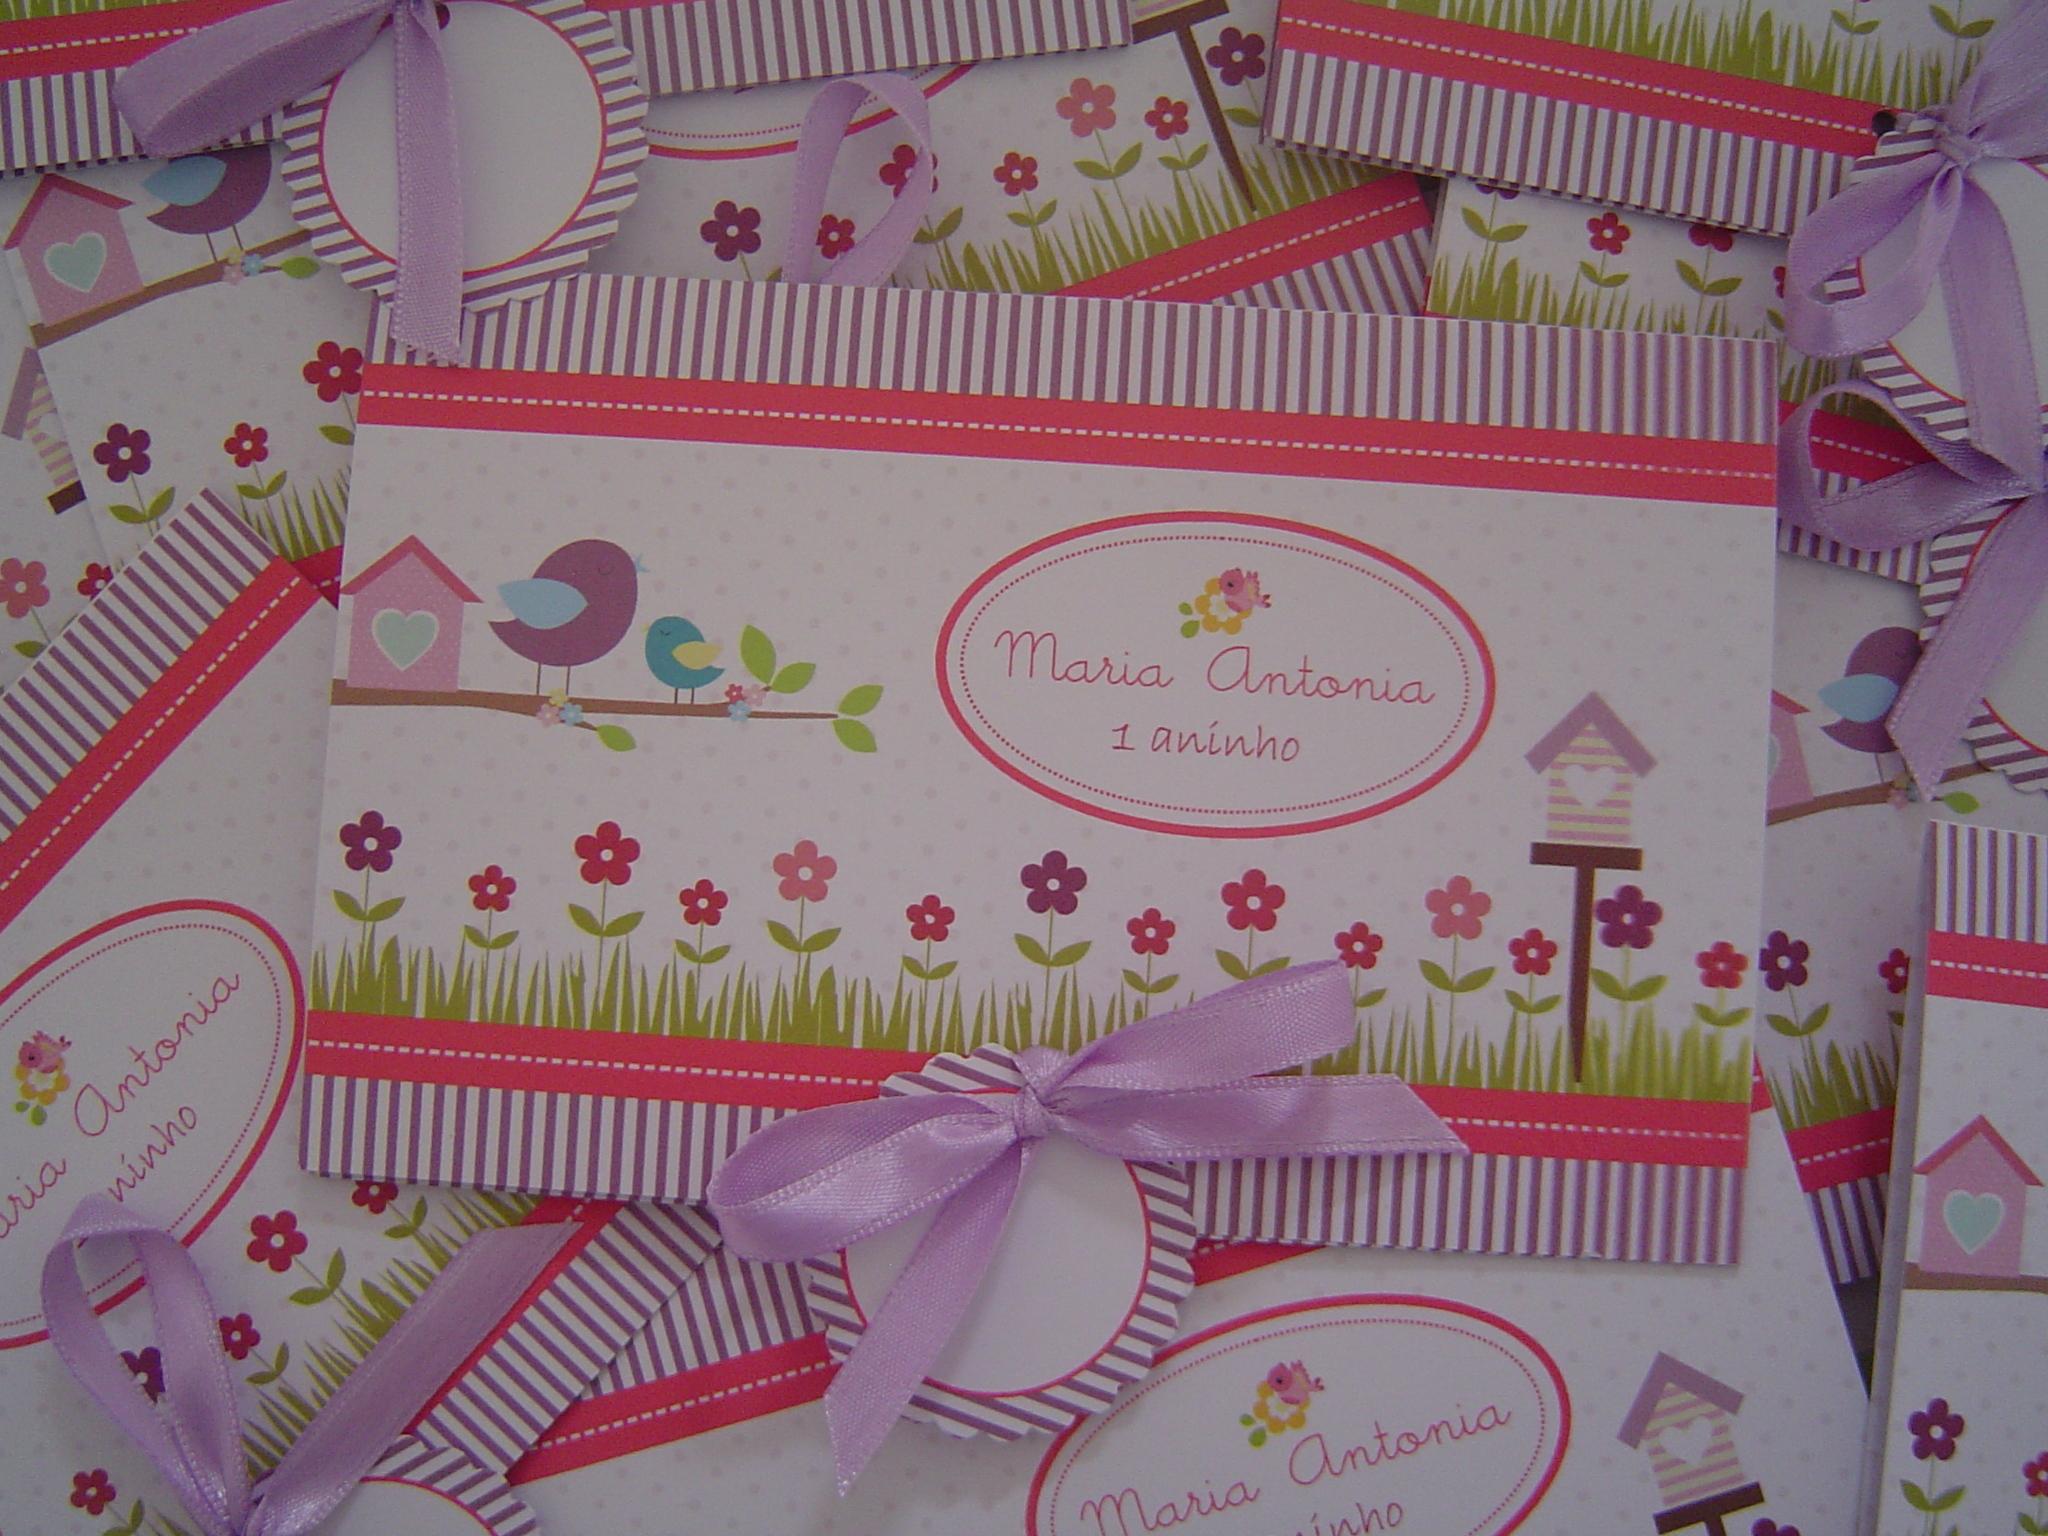 ideias para aniversario jardim encantado:convite jardim encantado aniversario convite jardim encantado convite